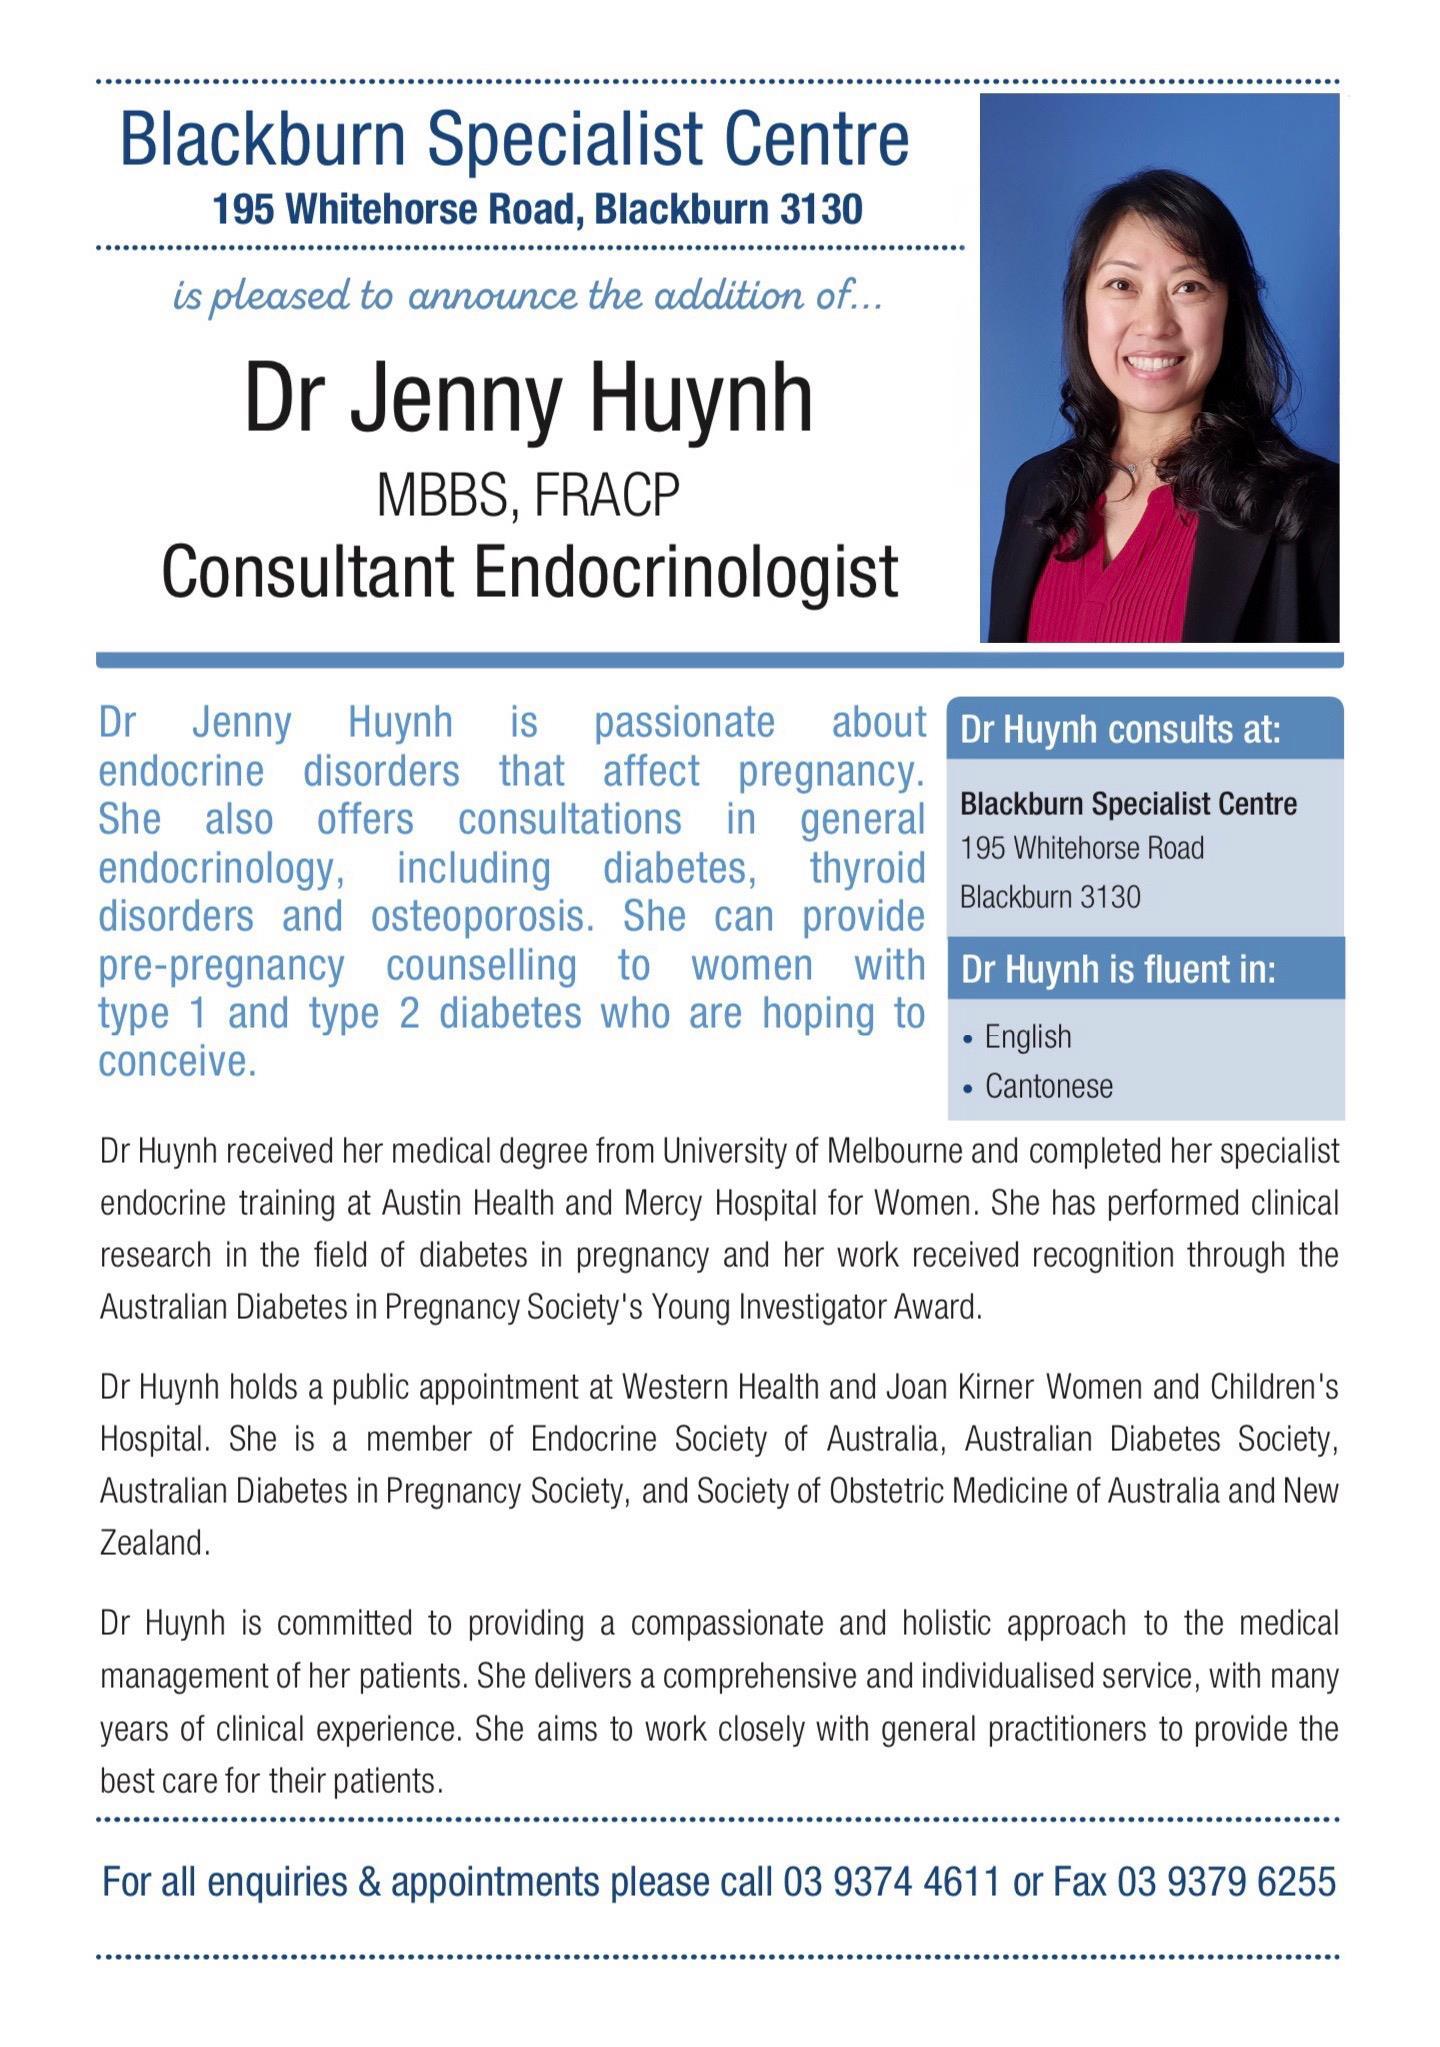 Dr Jenny Huynh